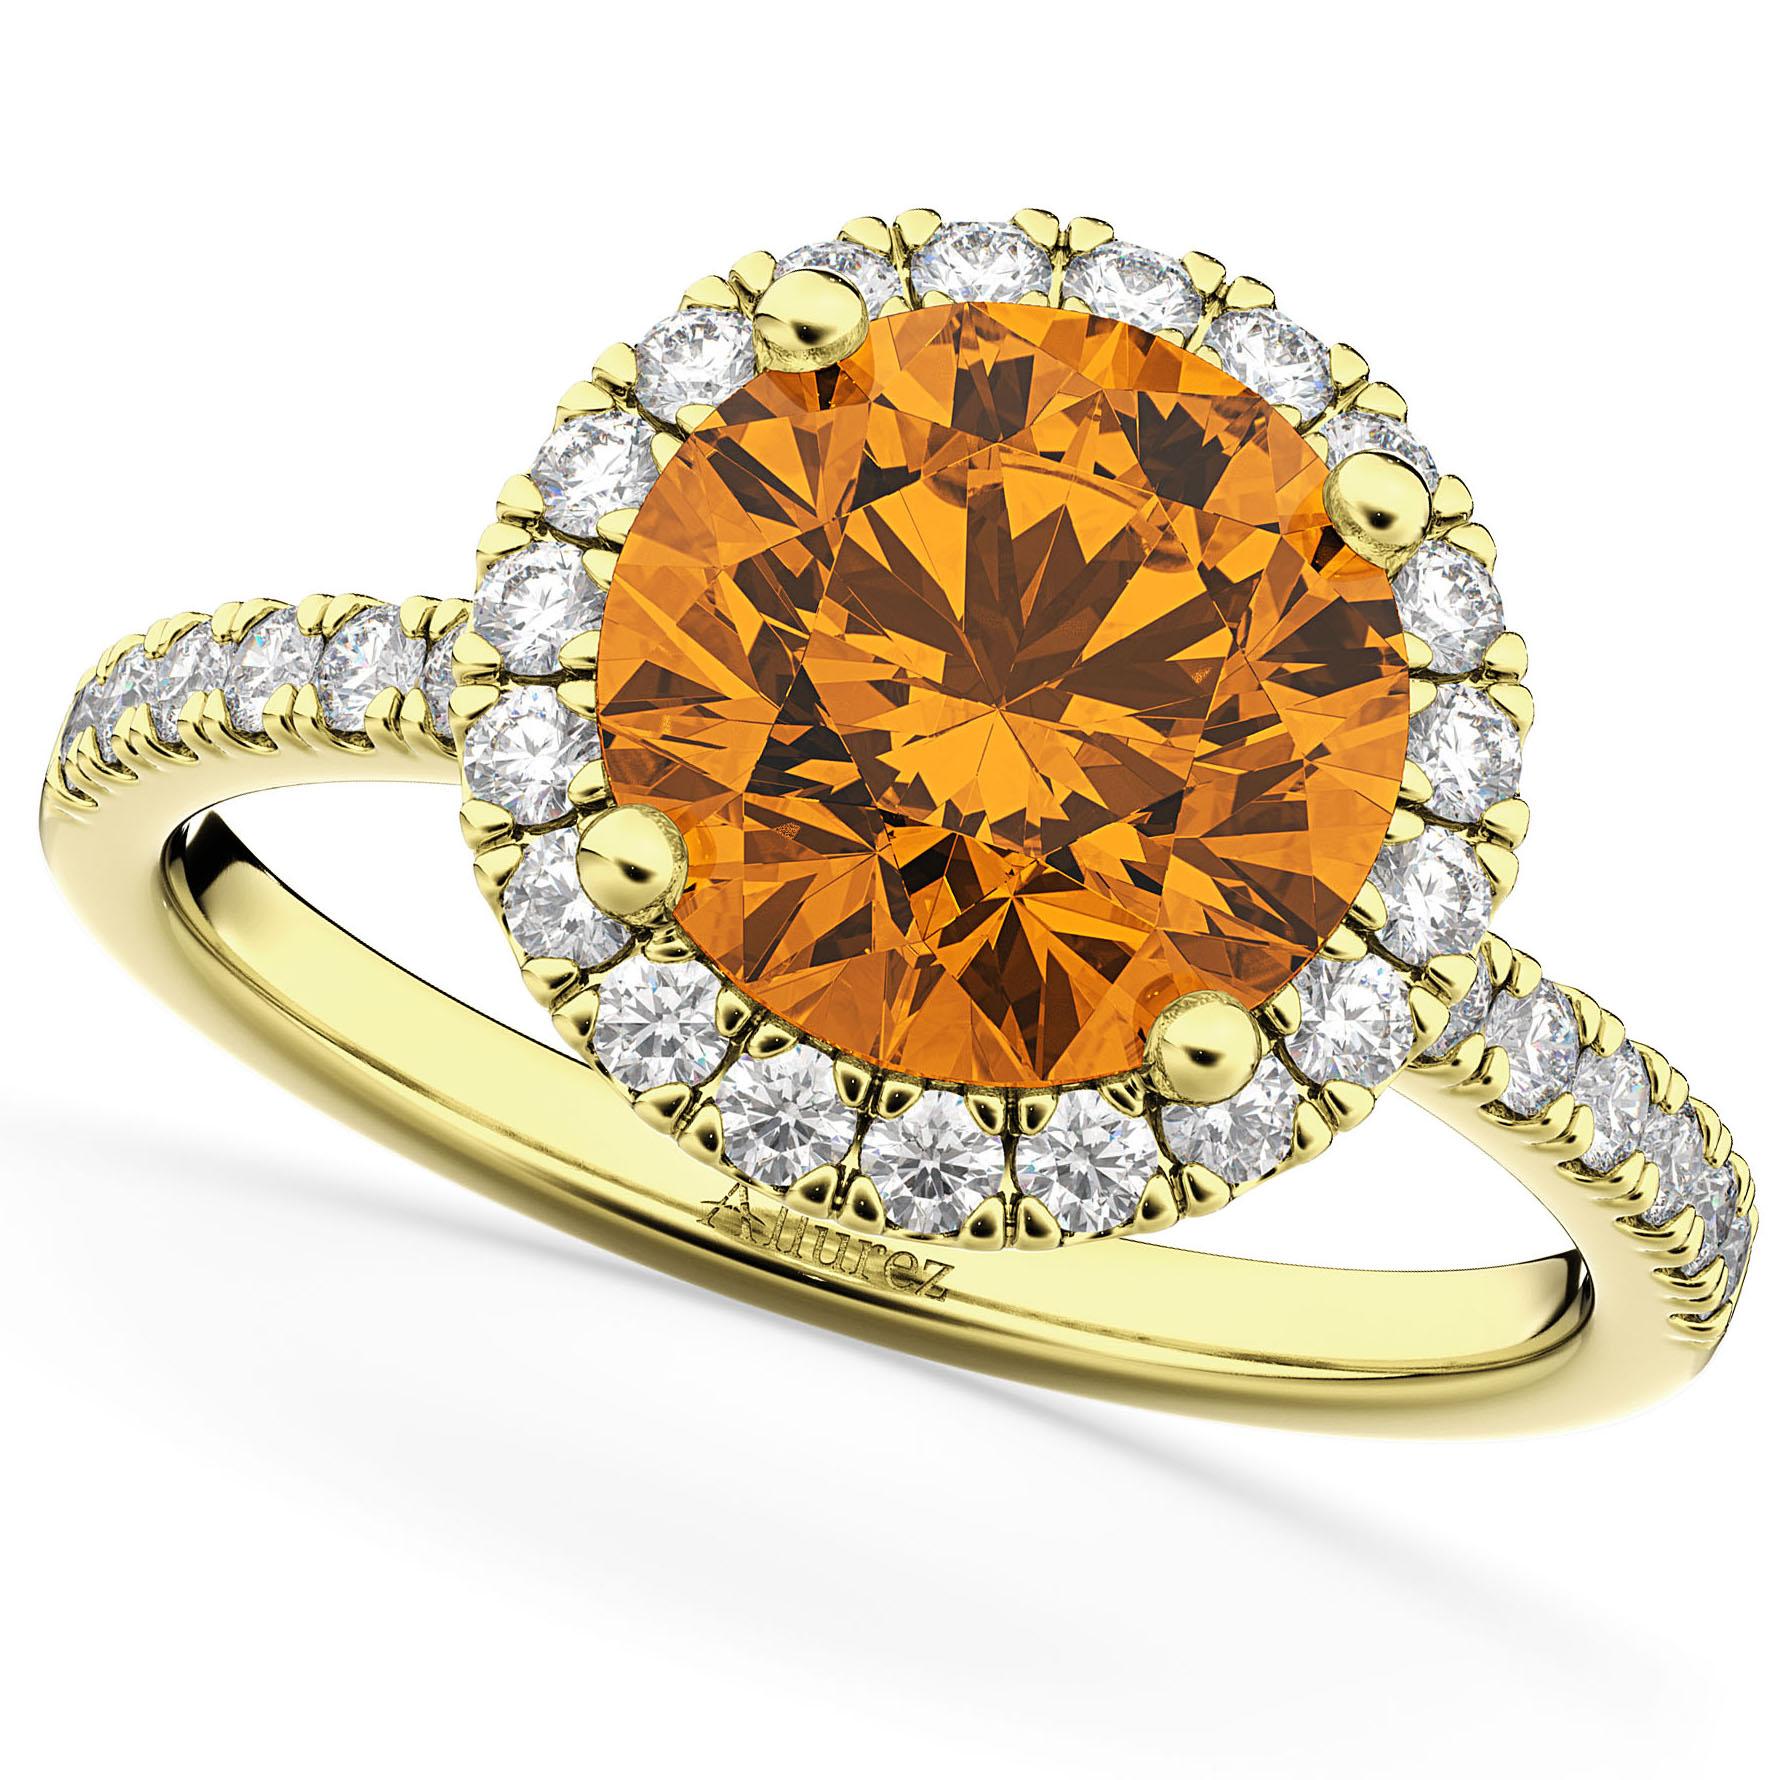 Halo Citrine & Diamond Engagement Ring 18K Yellow Gold 2.30ct